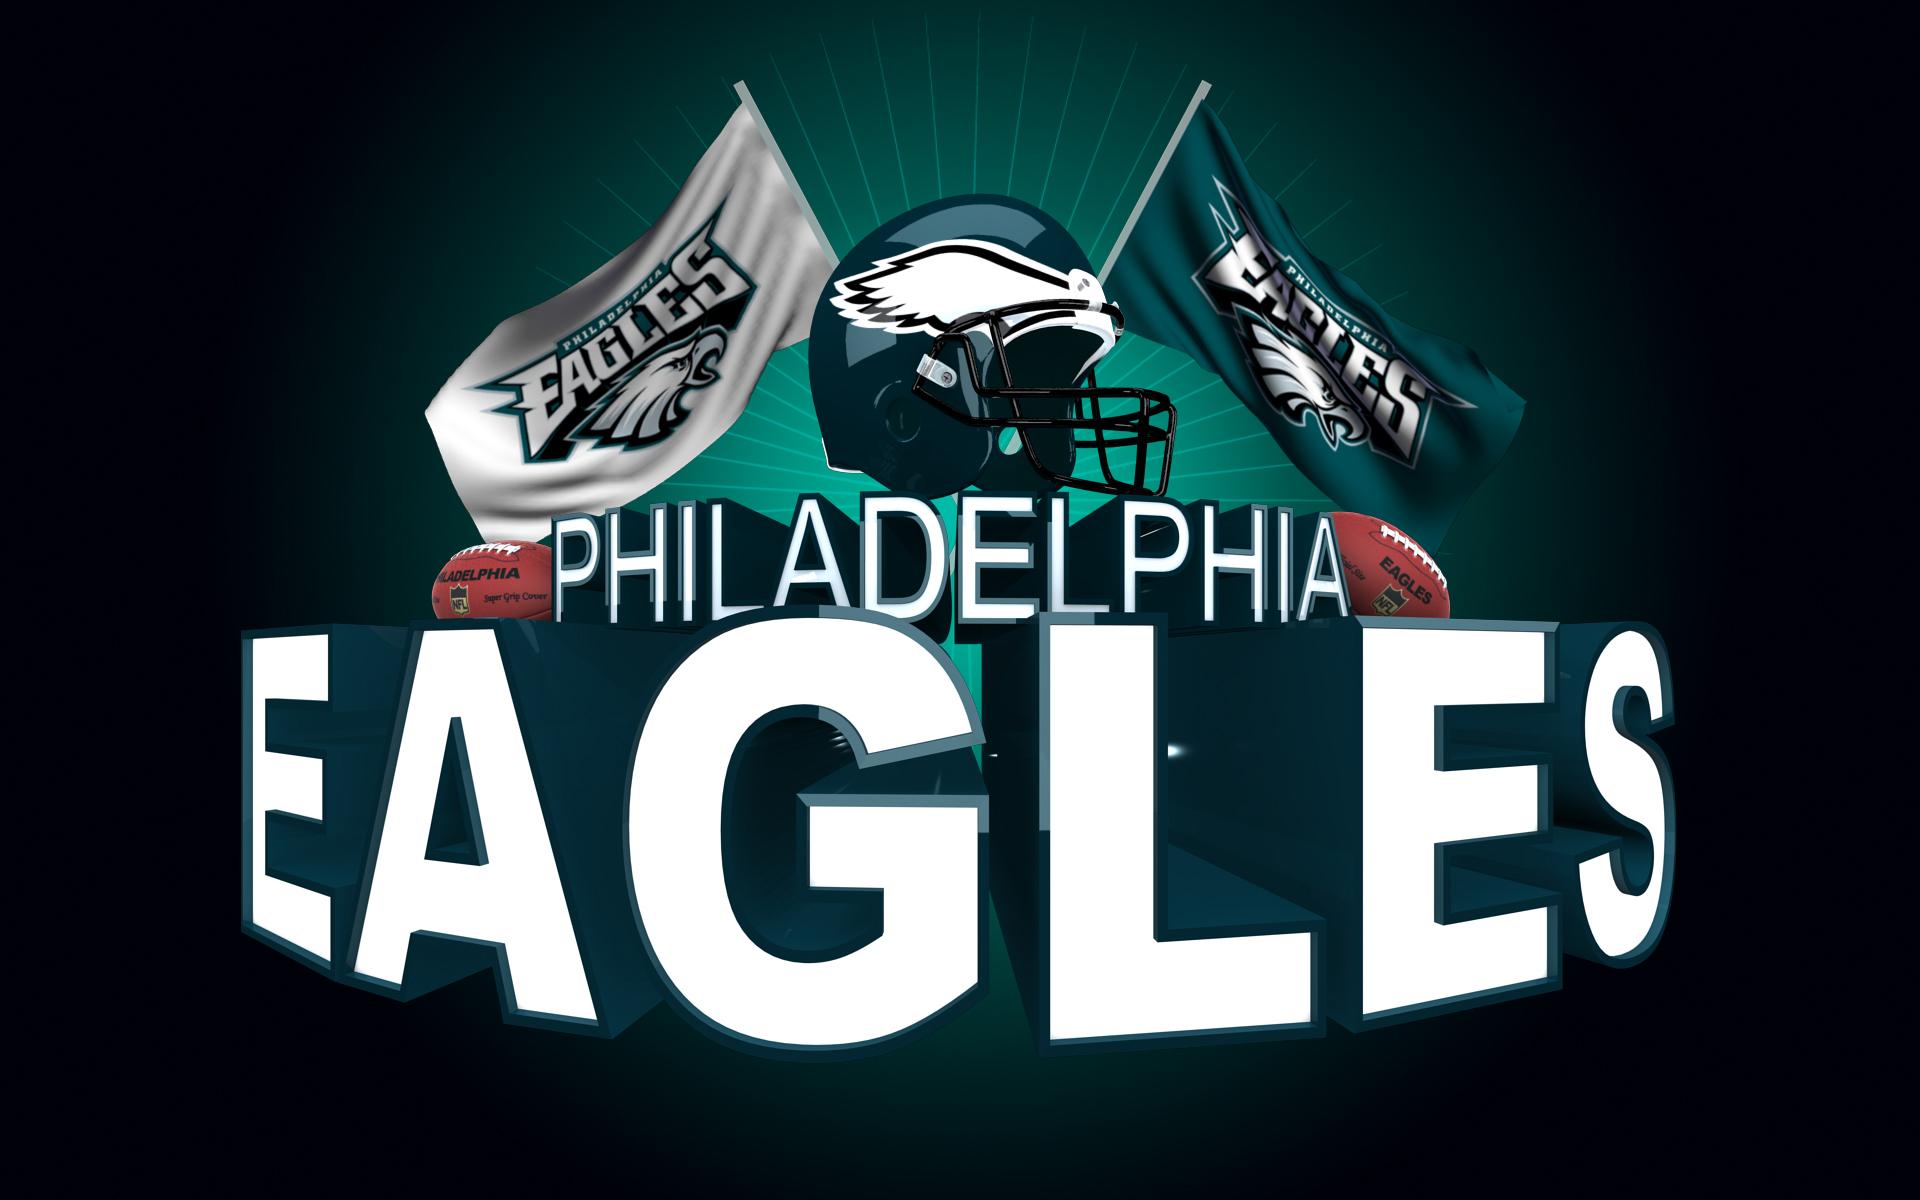 Eagles football team wallpaper - photo#25